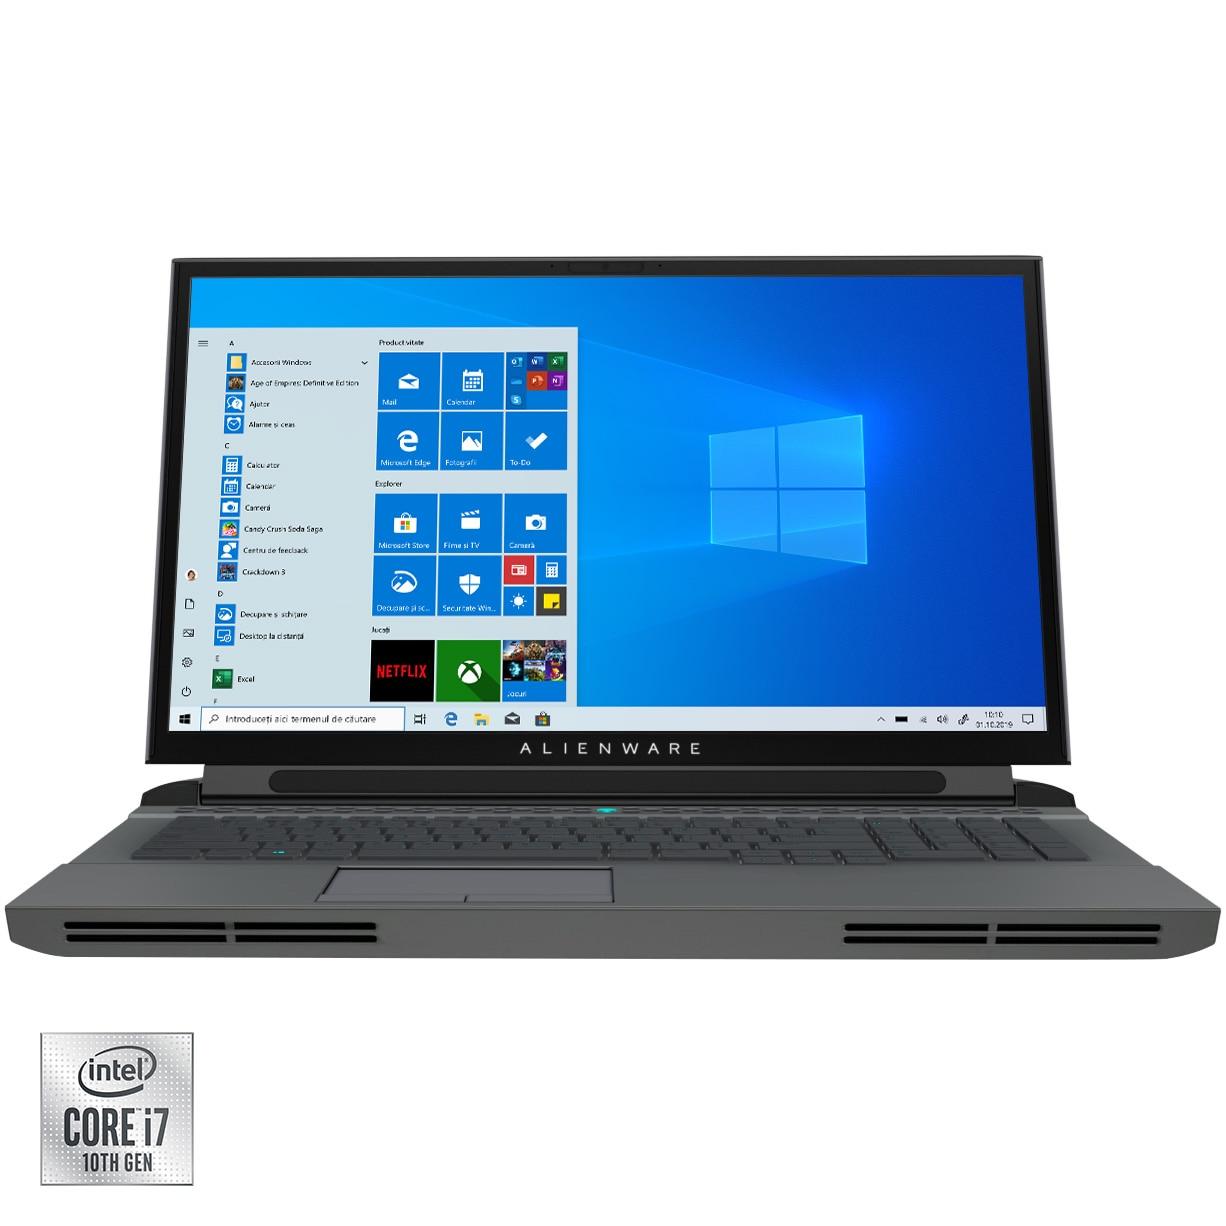 "Fotografie Laptop Gaming Alienware Area 51M R2 cu procesor Intel Core i7-10700K pana la 5.10 GHz, 17.3"", Full HD, 300Hz, 64GB, 2TB SSD + 1TB HDD, NVIDIA GeForce RTX 2080 SUPER 8GB, Windows 10 Pro, Dark Side of the Moon"